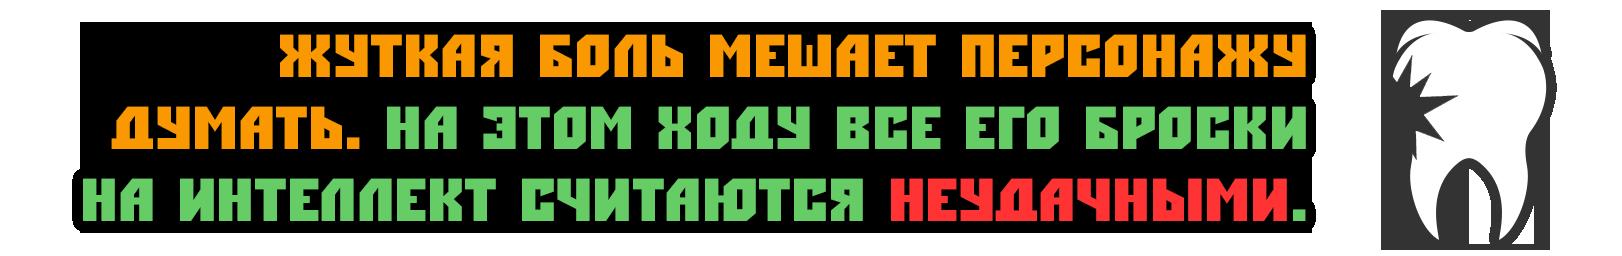 Тест боевой системы - Страница 2 O4ki_Urona_Zhutkaja_bol_Forum_Vova_5